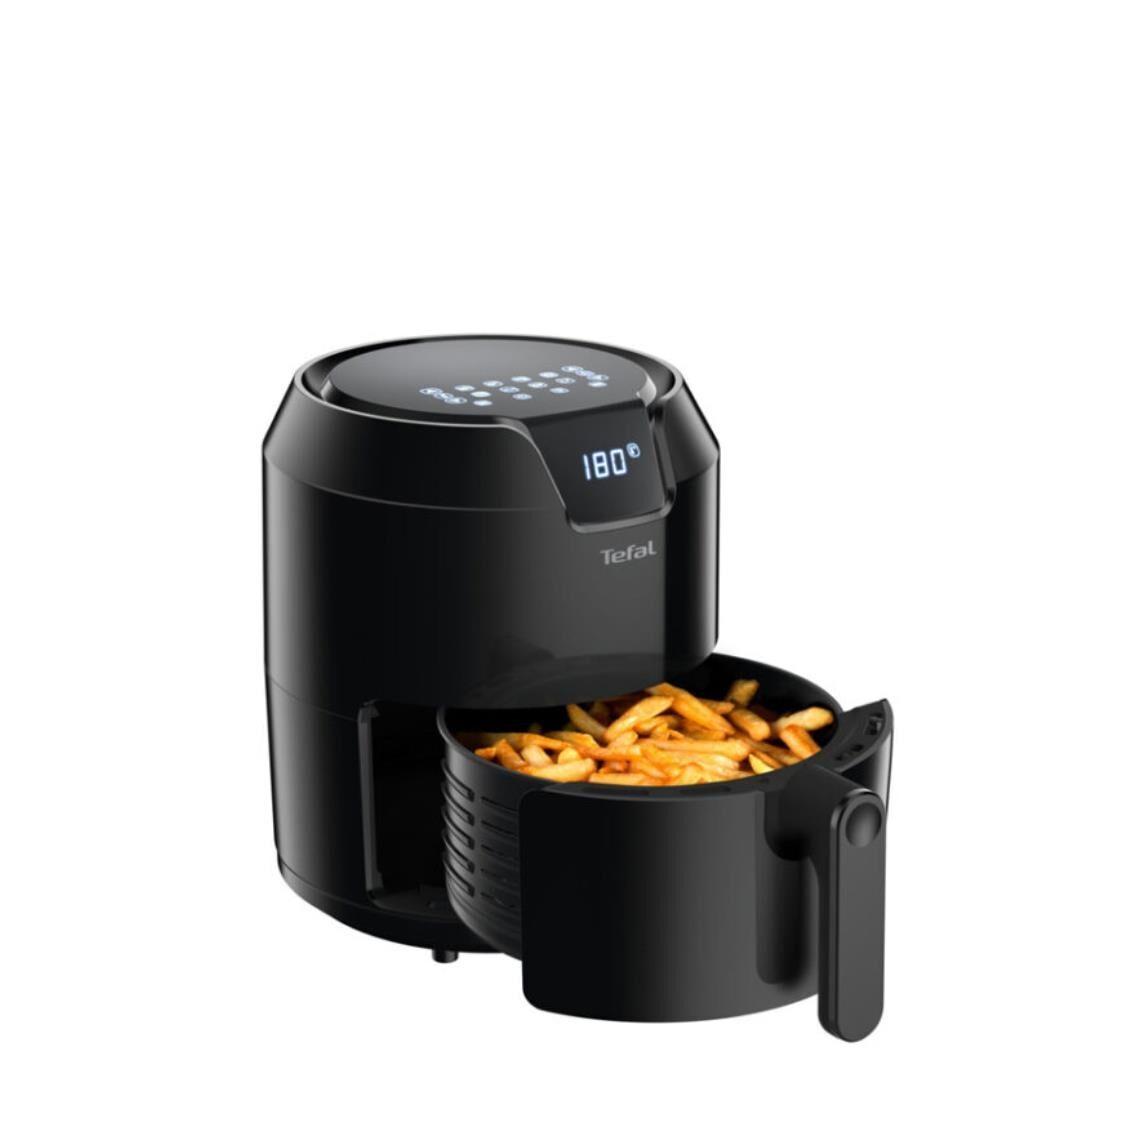 Tefal Easy Fry Precision Oil Less Fryer 42L